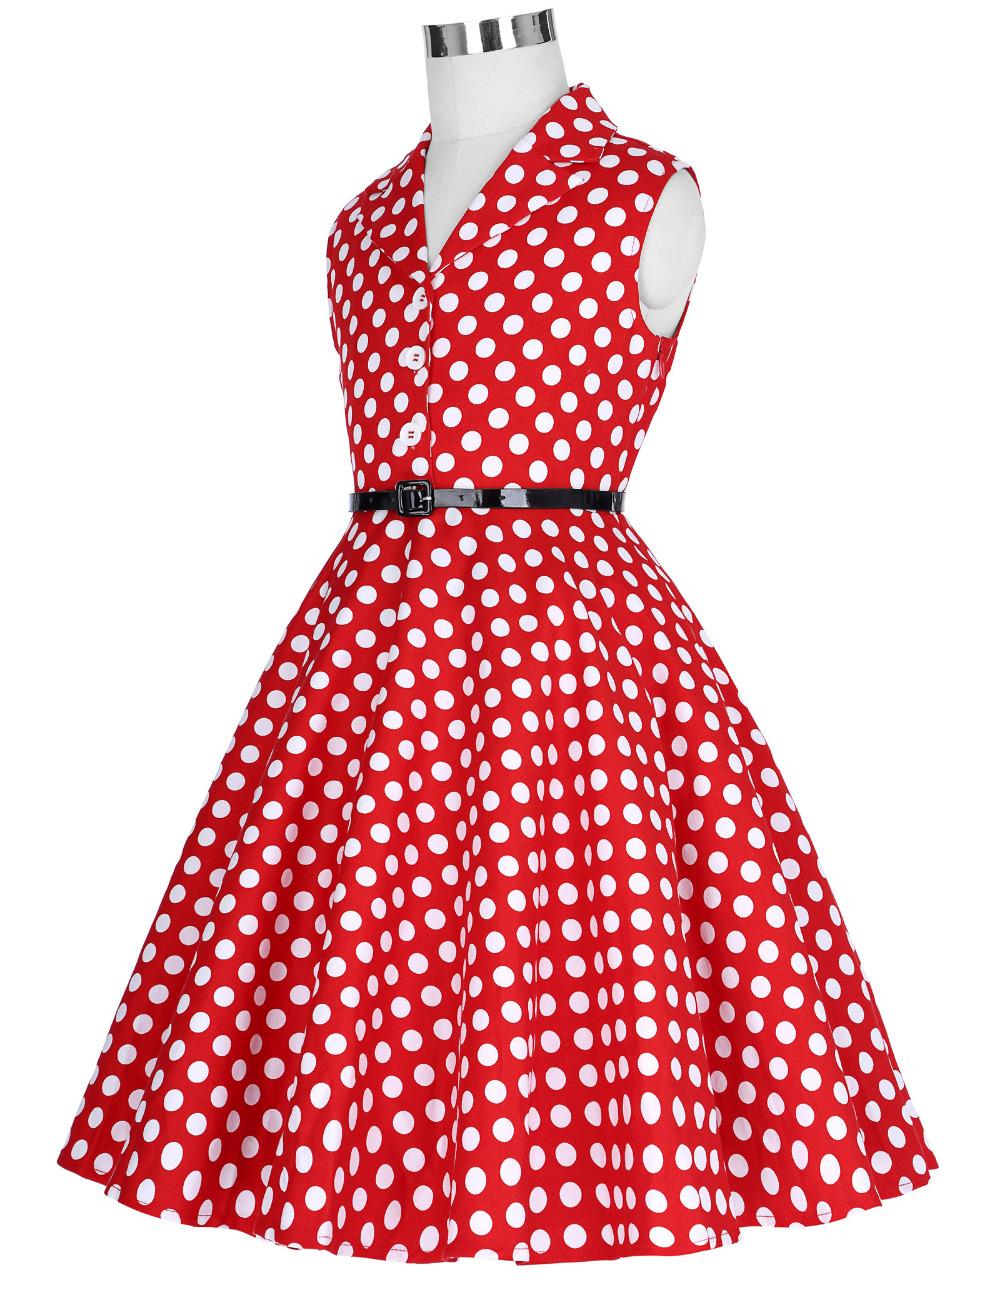 Grace Karin Flower Girl Dresses for Weddings 2017 Sleeveless Polka Dots Printed Vintage Pin Up Style Children's Clothing 17